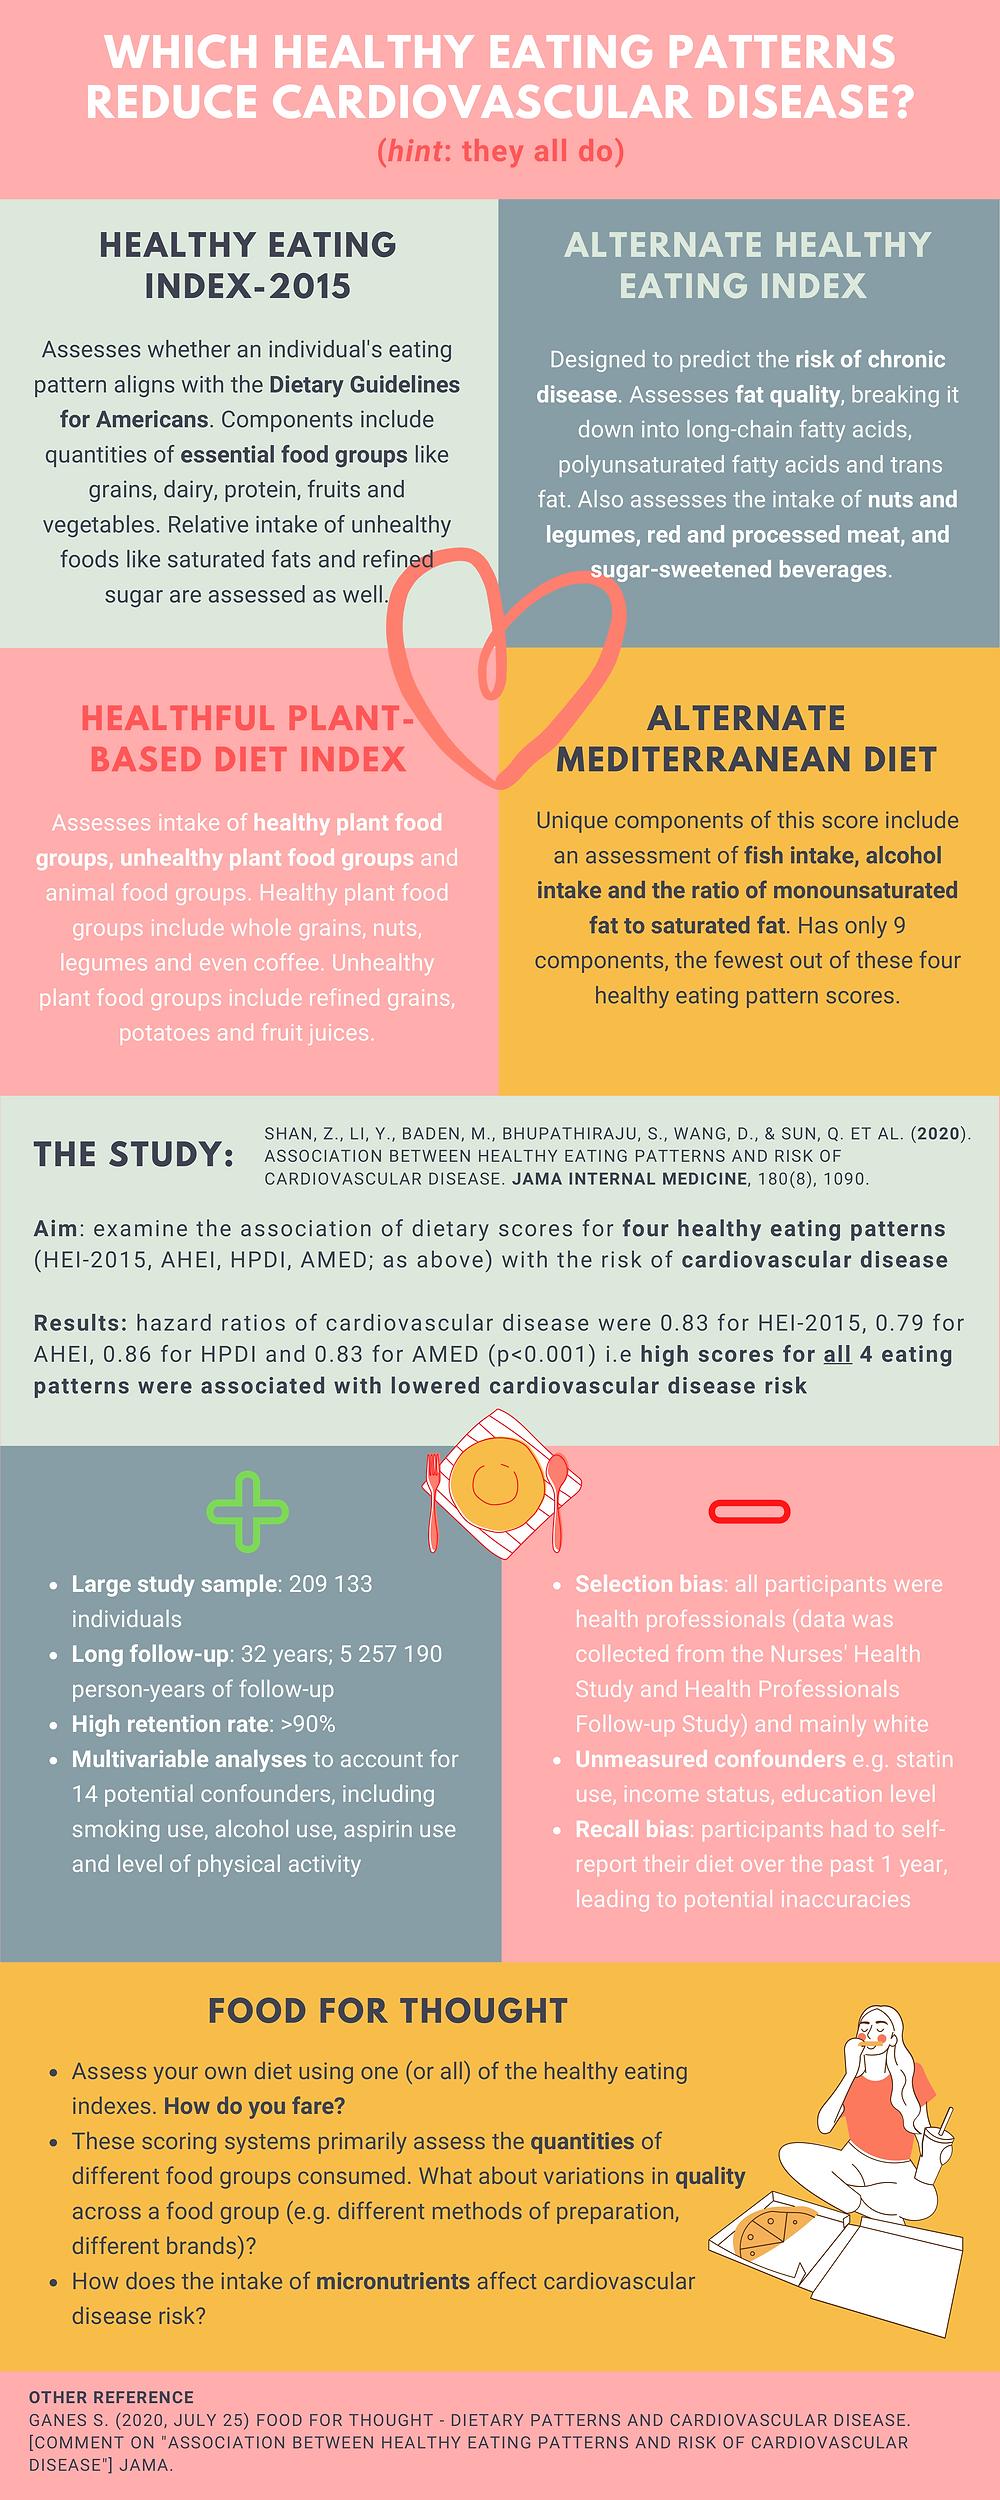 heart health, cardiovascular disease, mediterranean diet, plant-based, healthy eating index